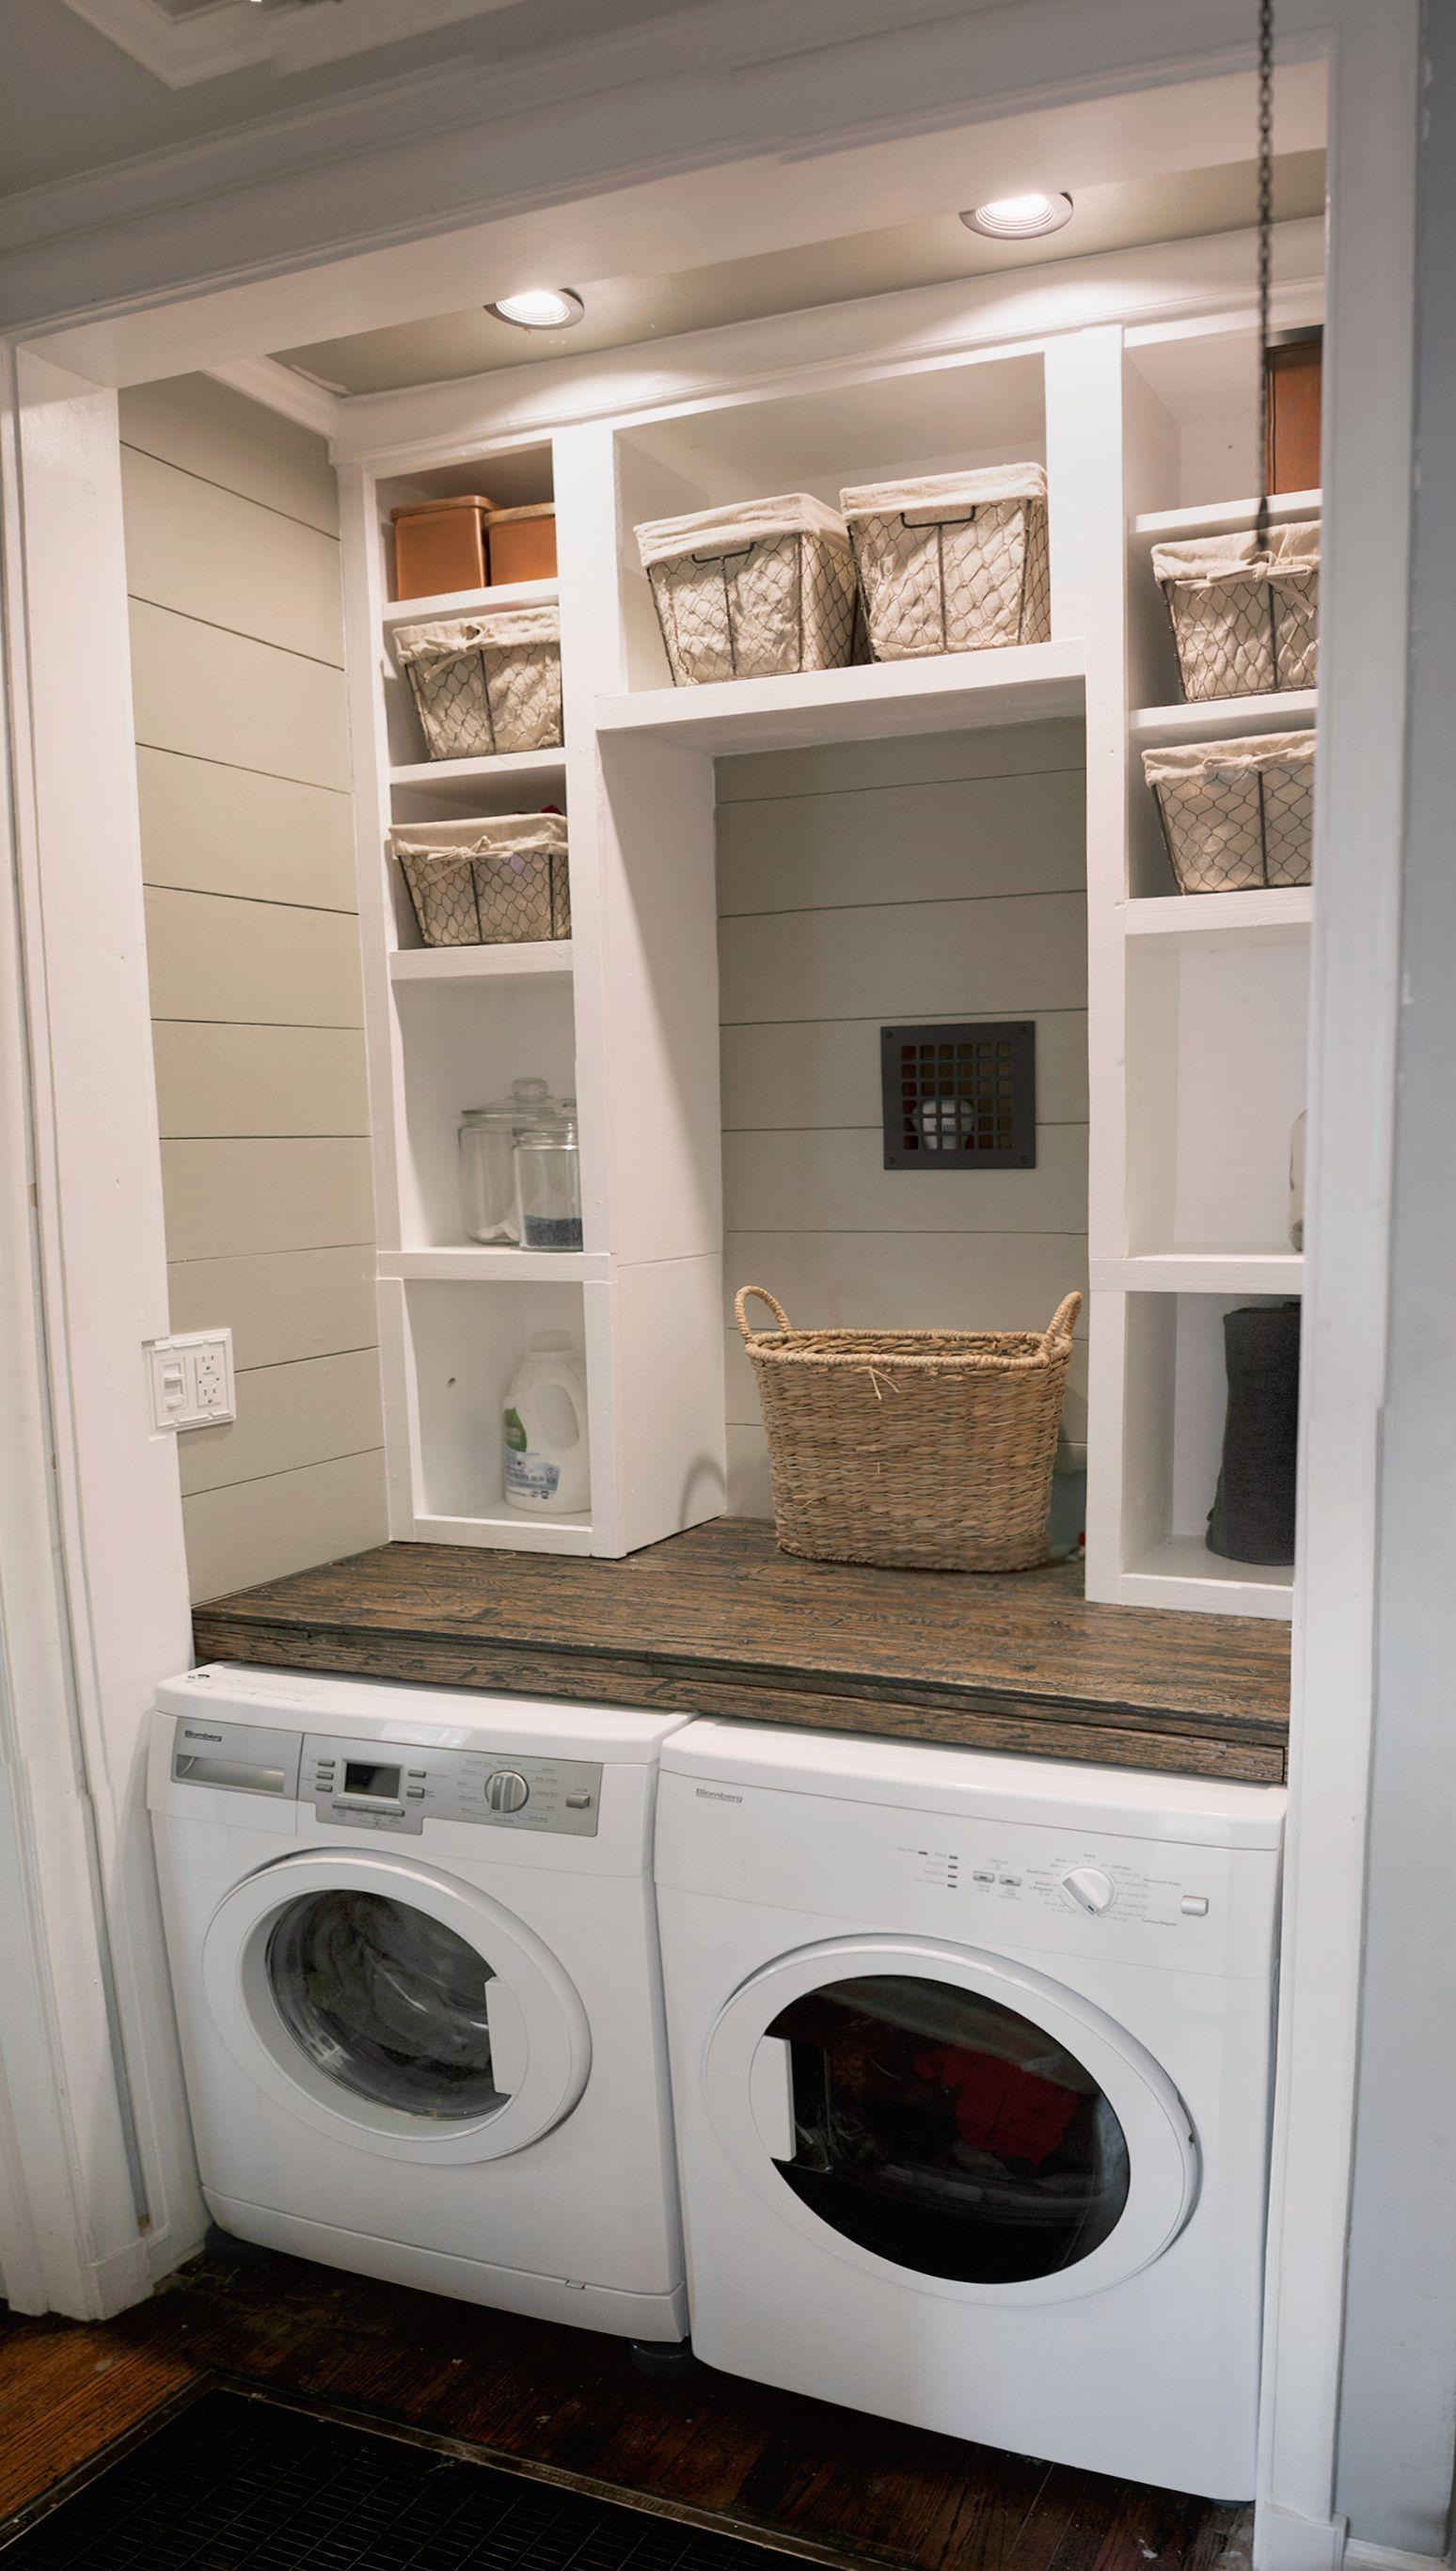 Closet To Laundry Room Conversion  Imgur